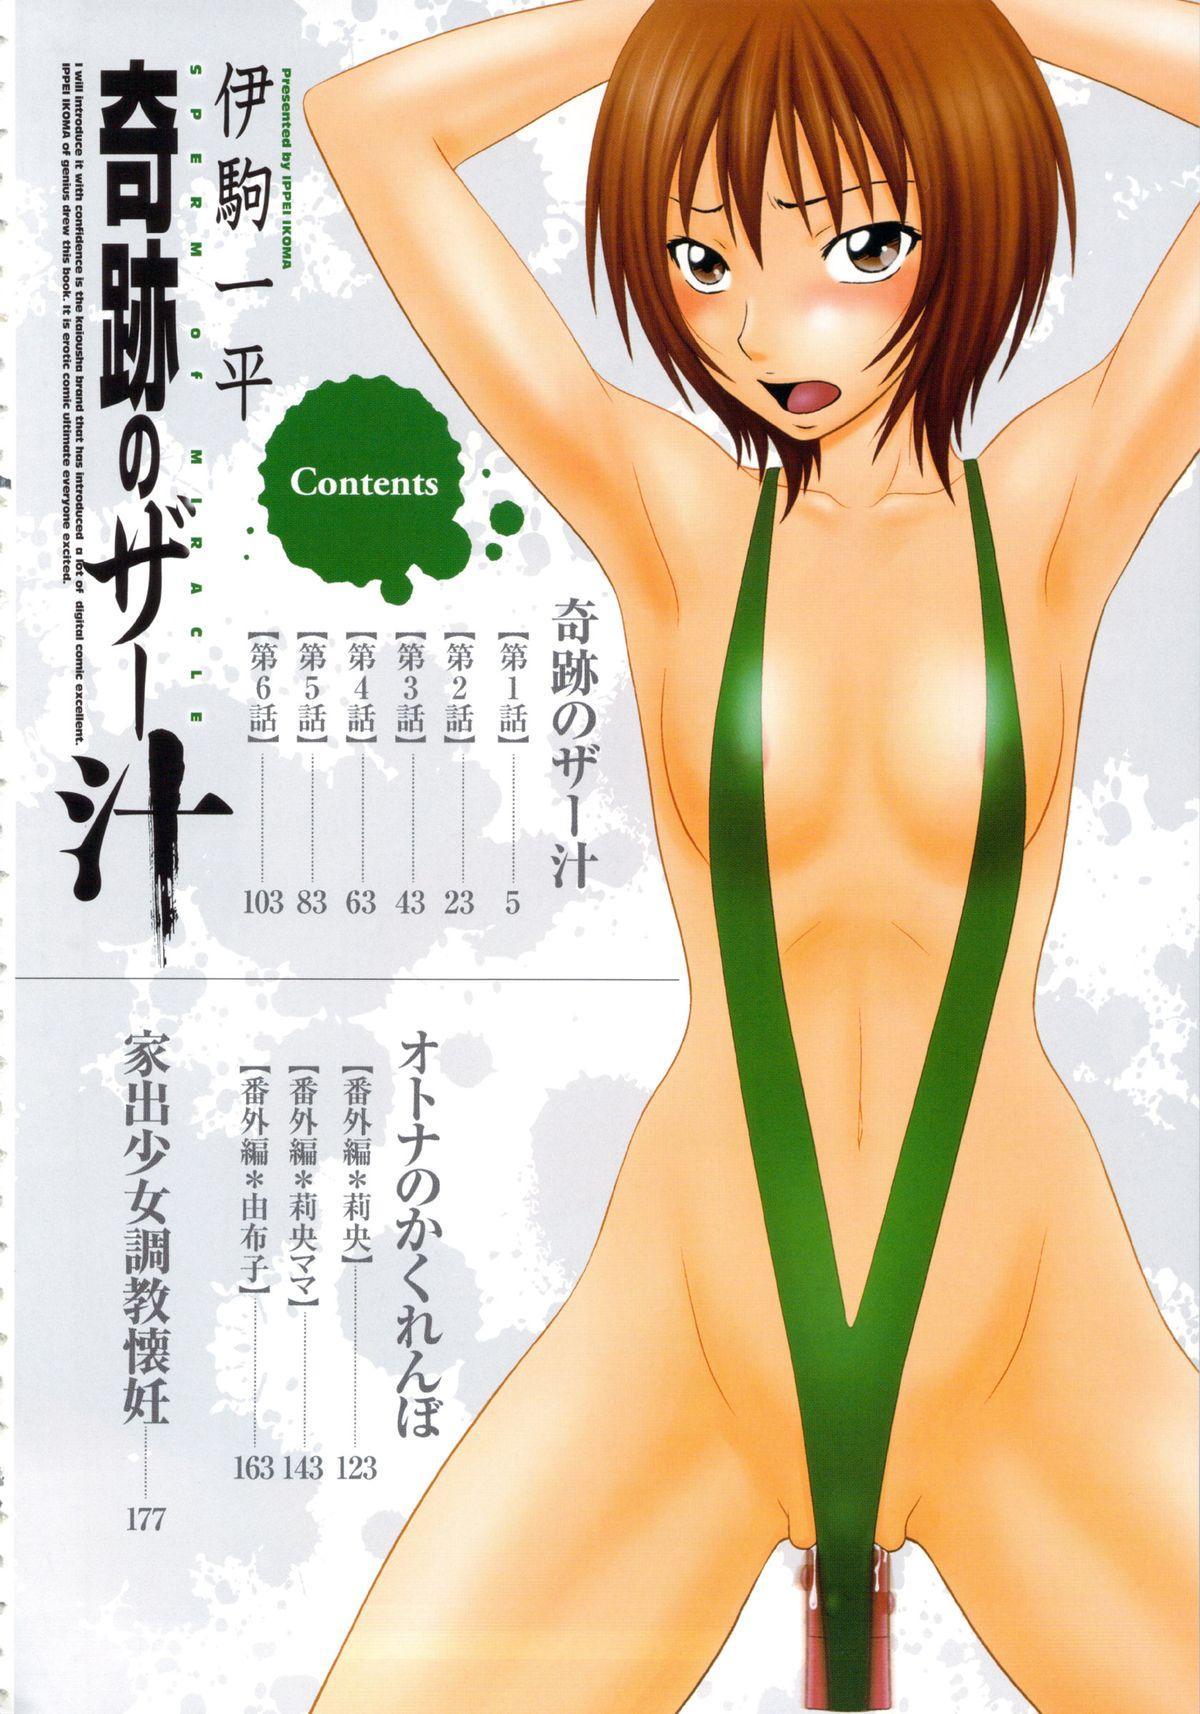 Kiseki No Zaajiru - Sperm of Miracle 4